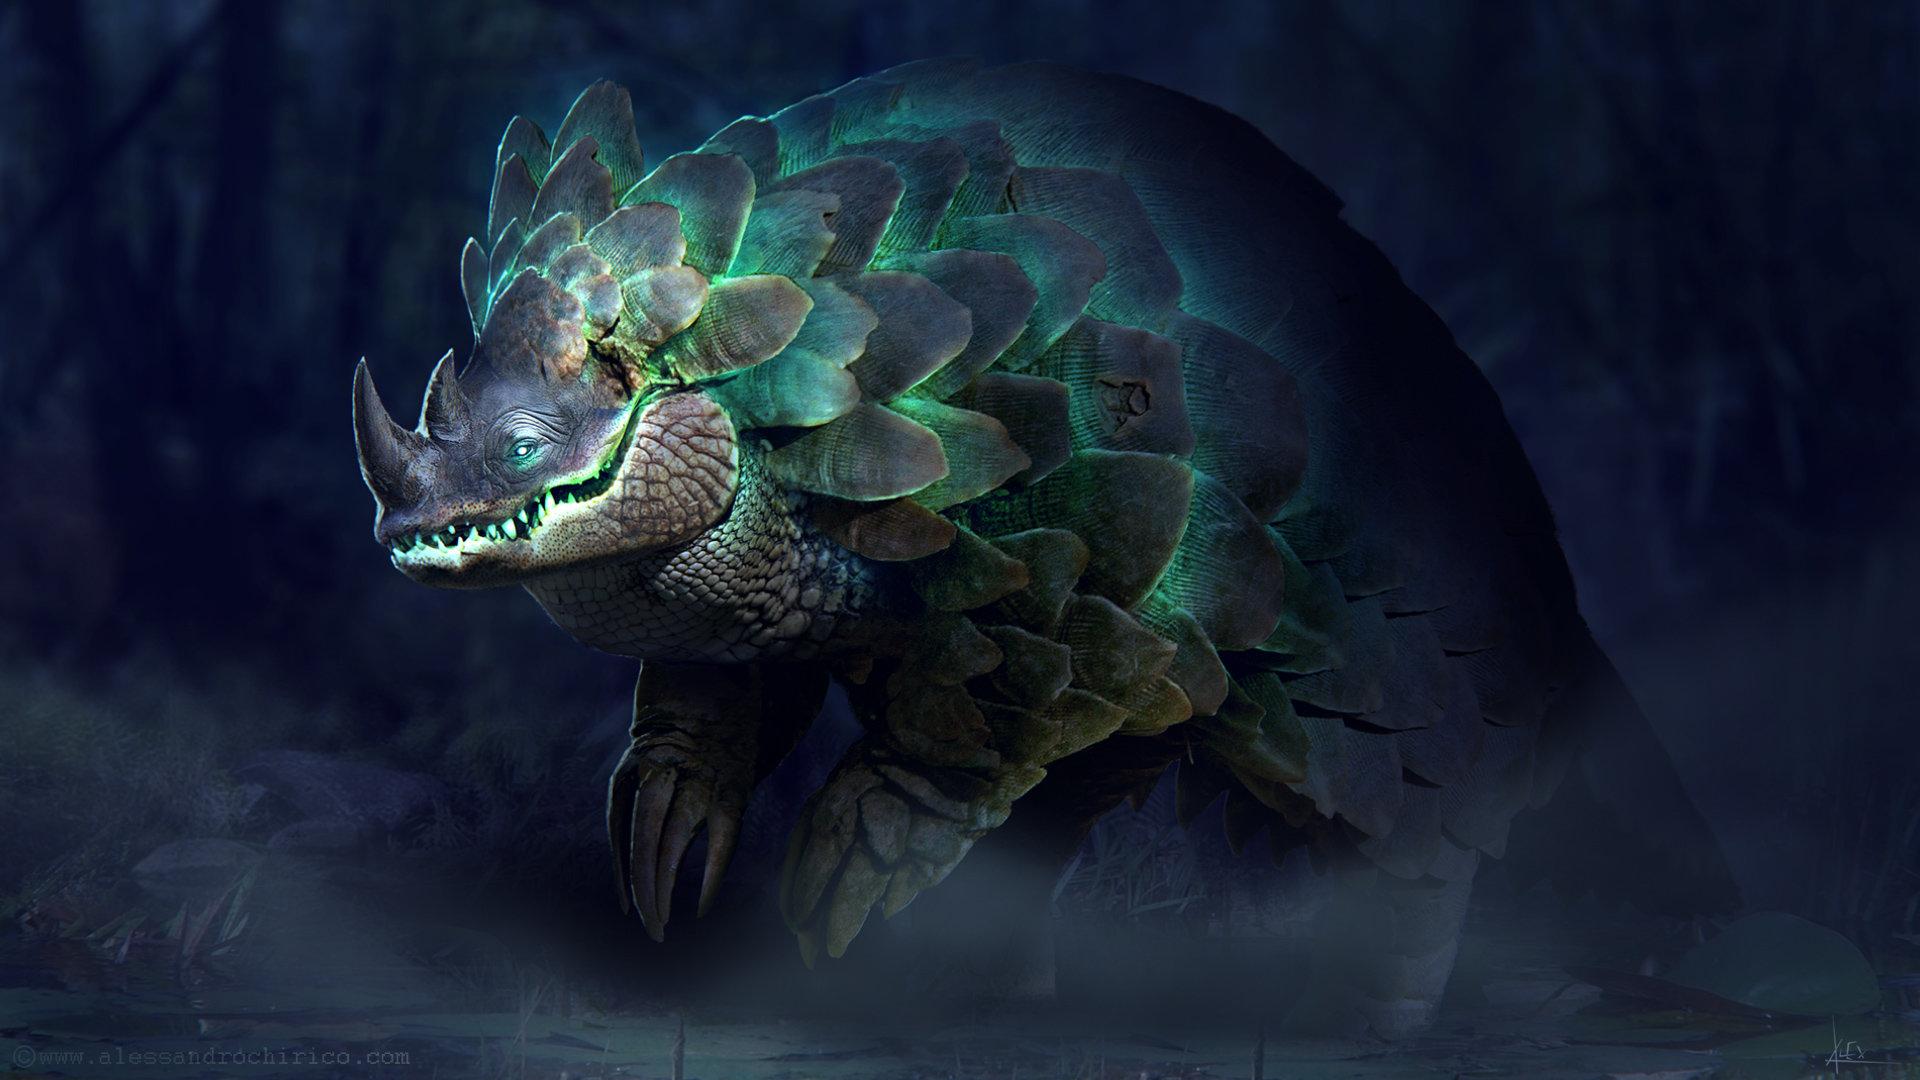 Alessandro chirico swamp creature alessandro chirico glow